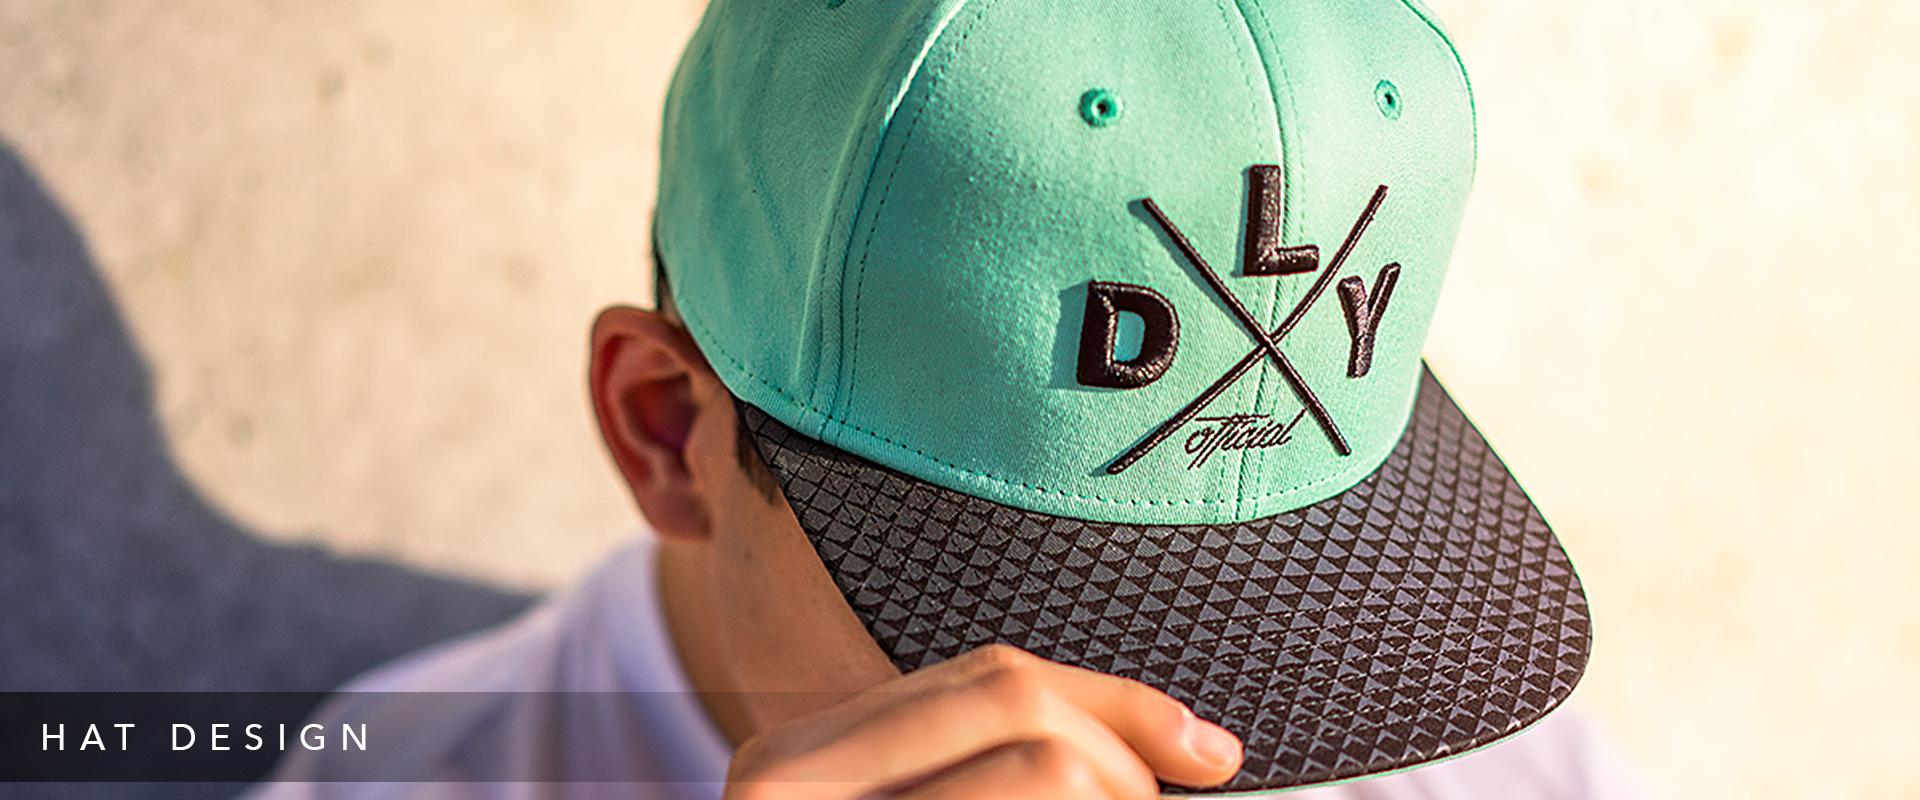 JoshMackey-Merchandise-DailyDriven-Hats.jpg